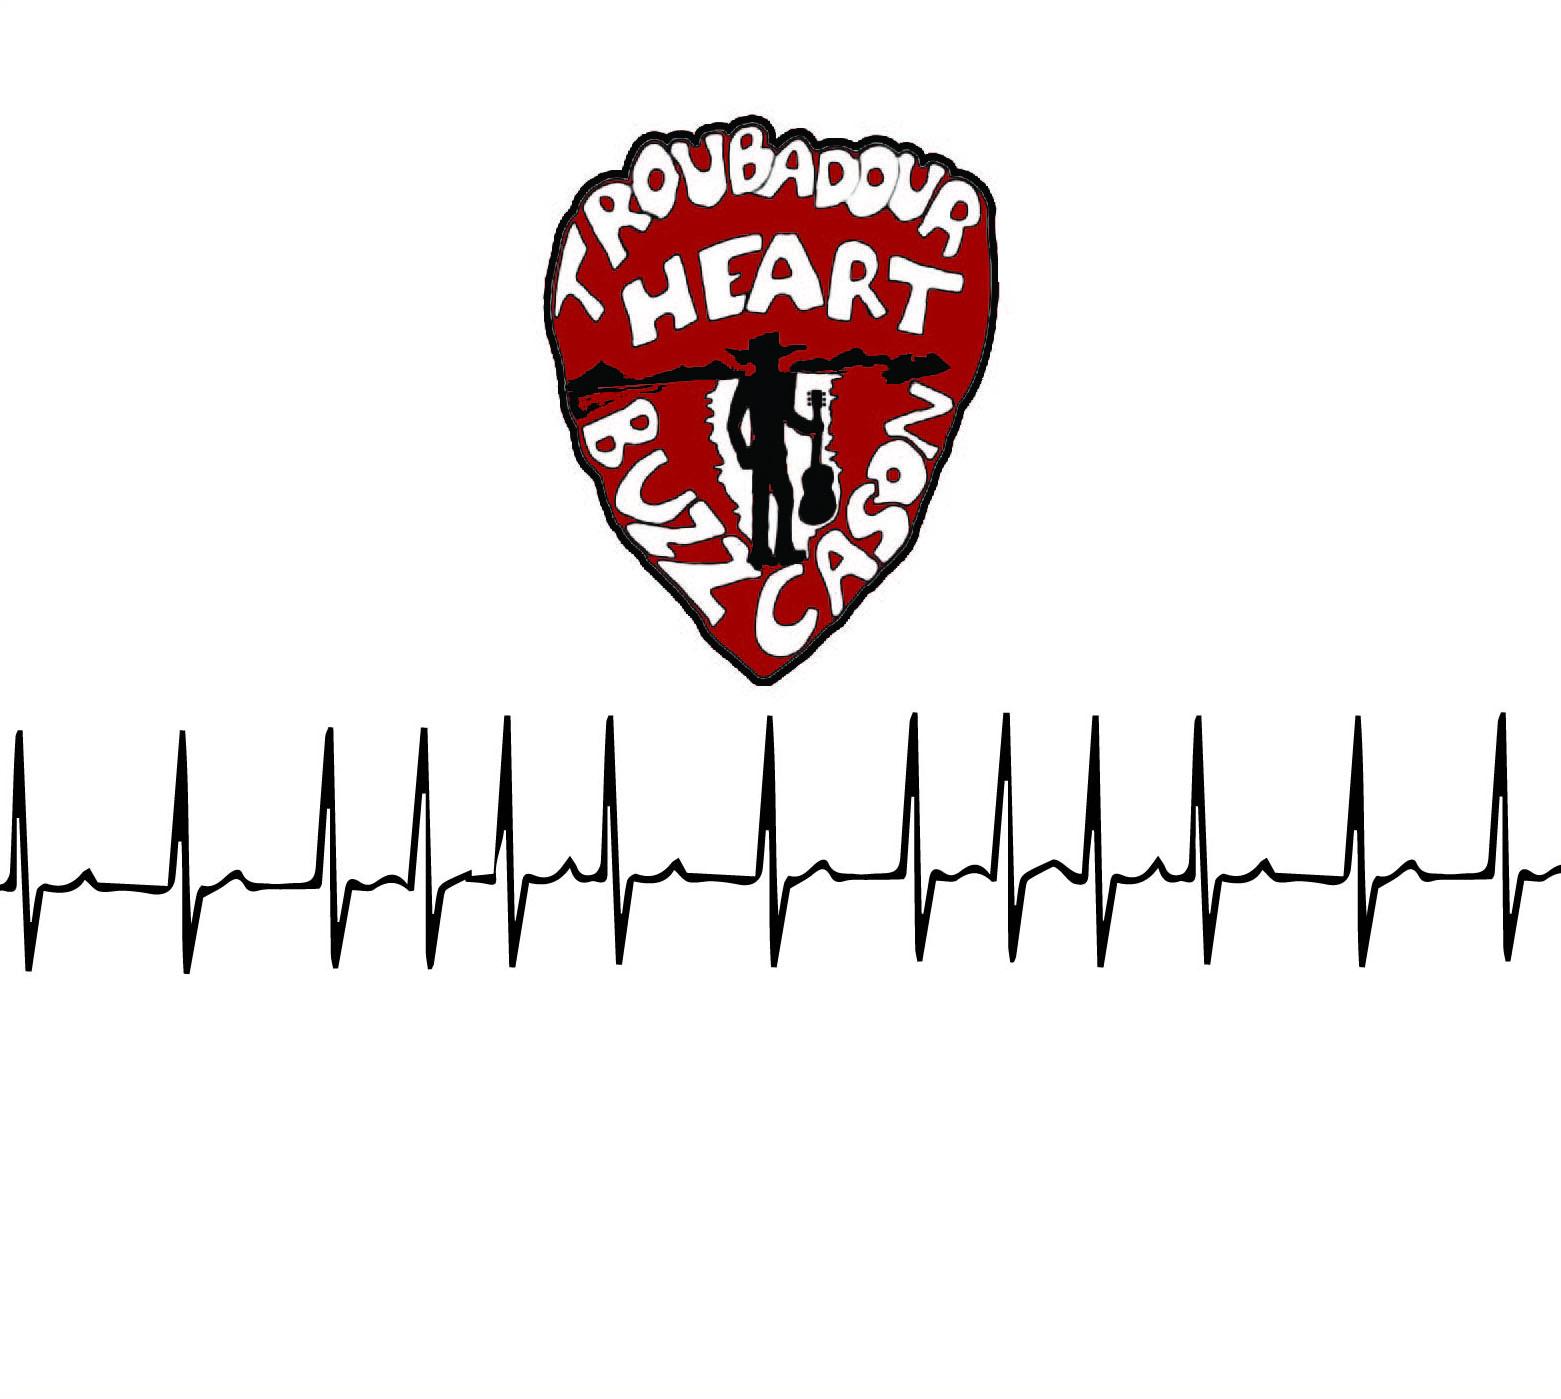 Troubadour Heart (Plowboy Records, 2014)